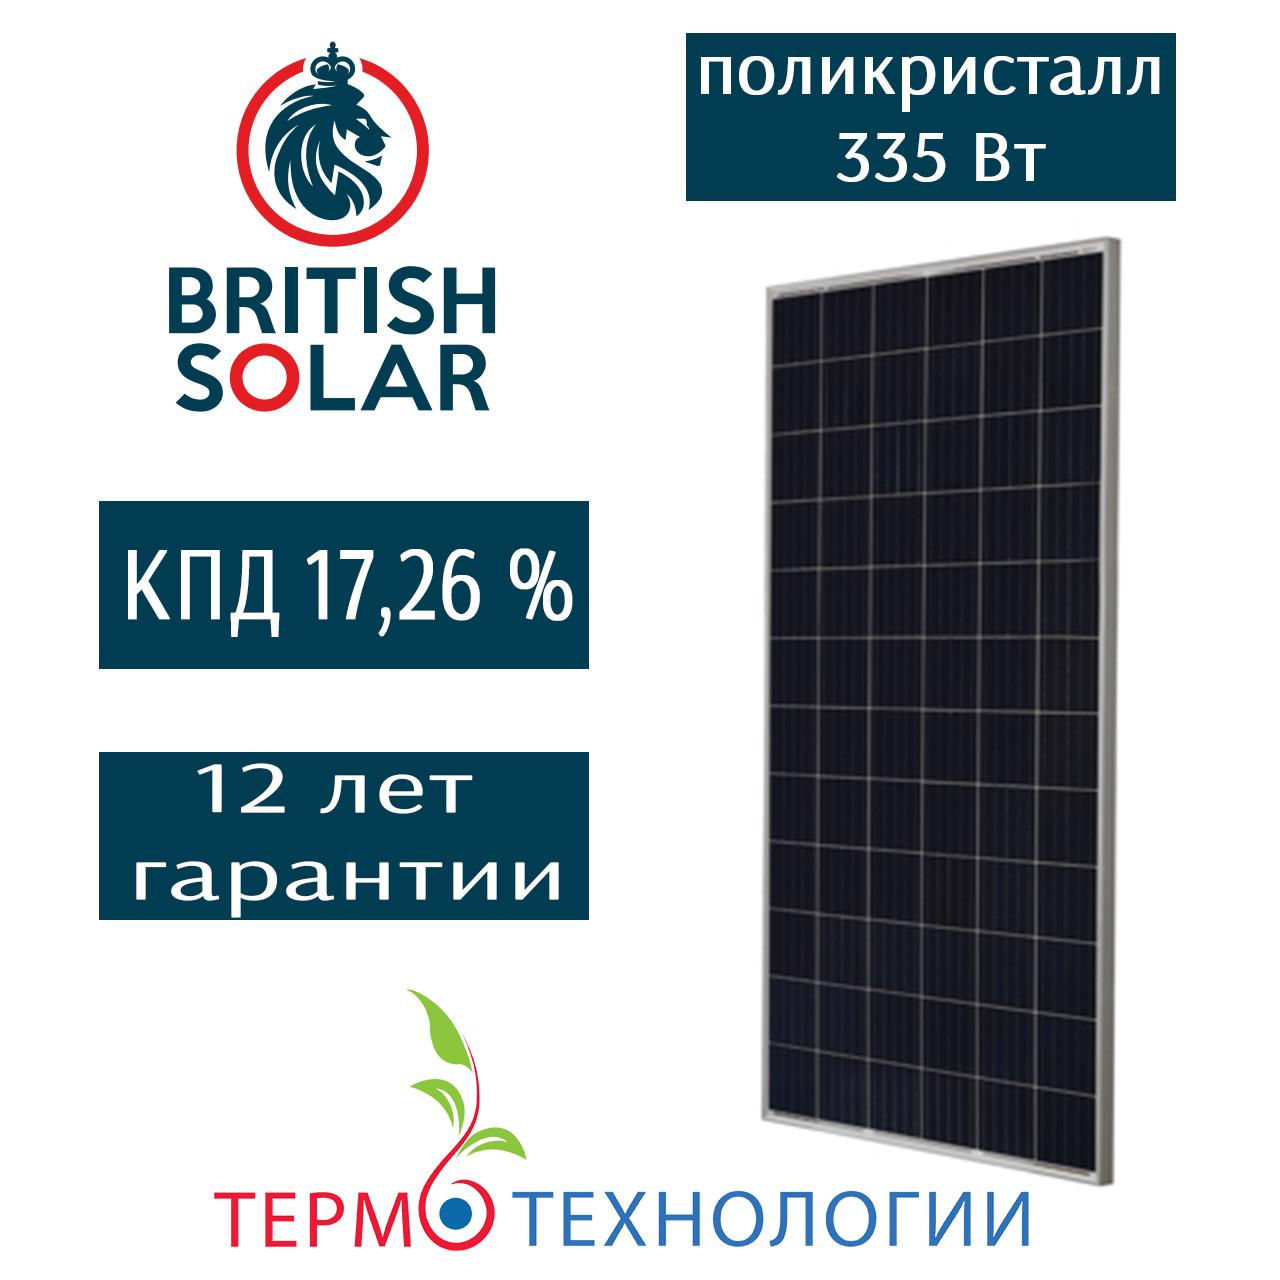 Солнечная батарея British solar 335 Вт, Poly